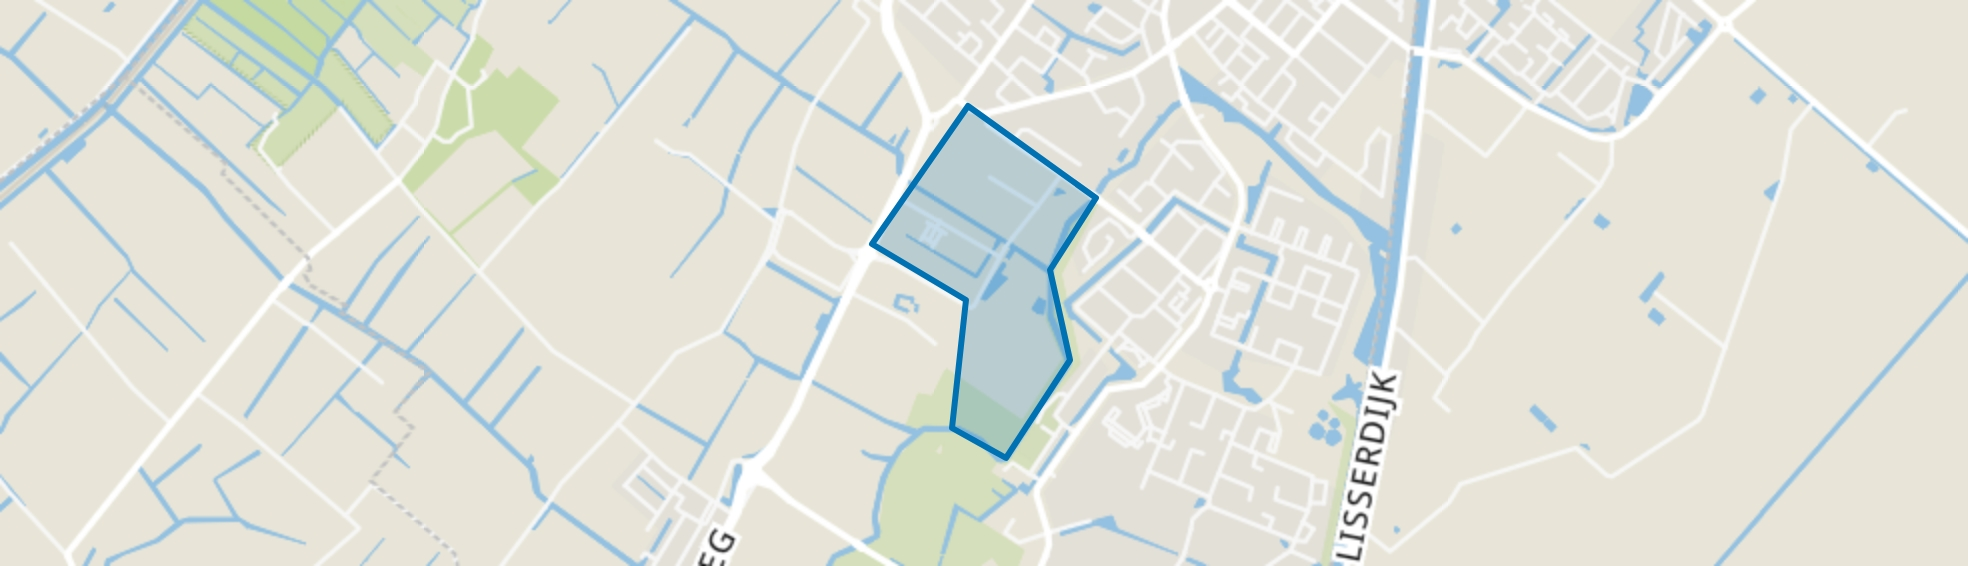 Dever, Lisse map